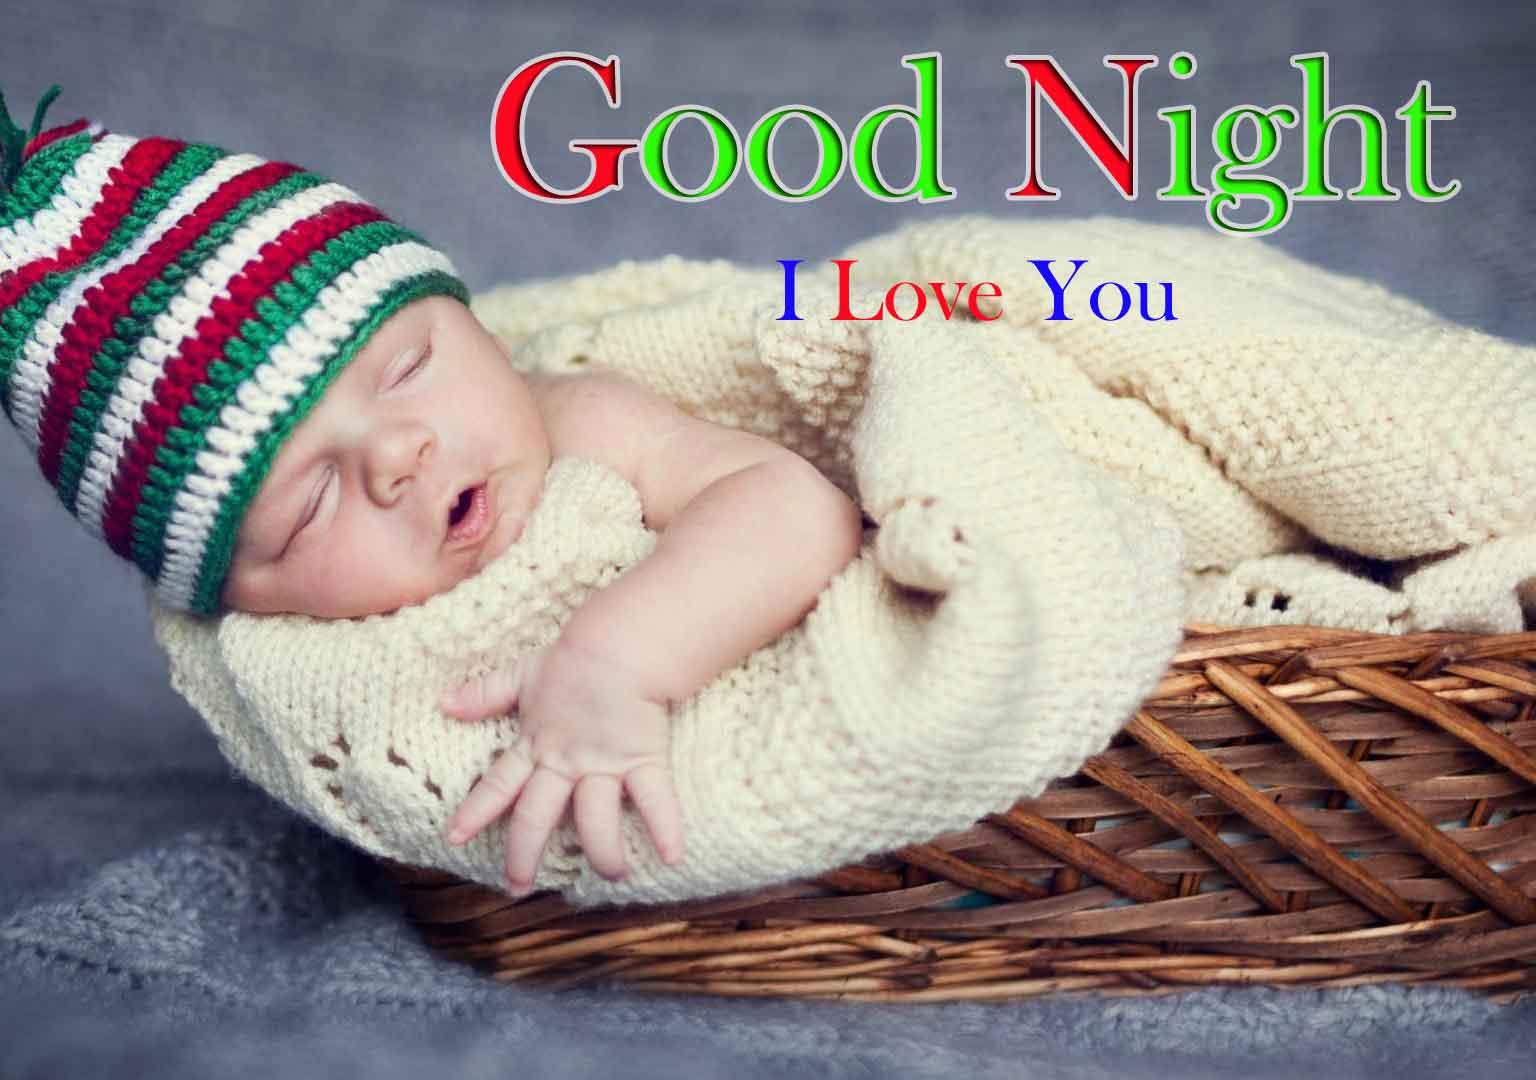 For GF HD Beautiful Cute Good Night Images